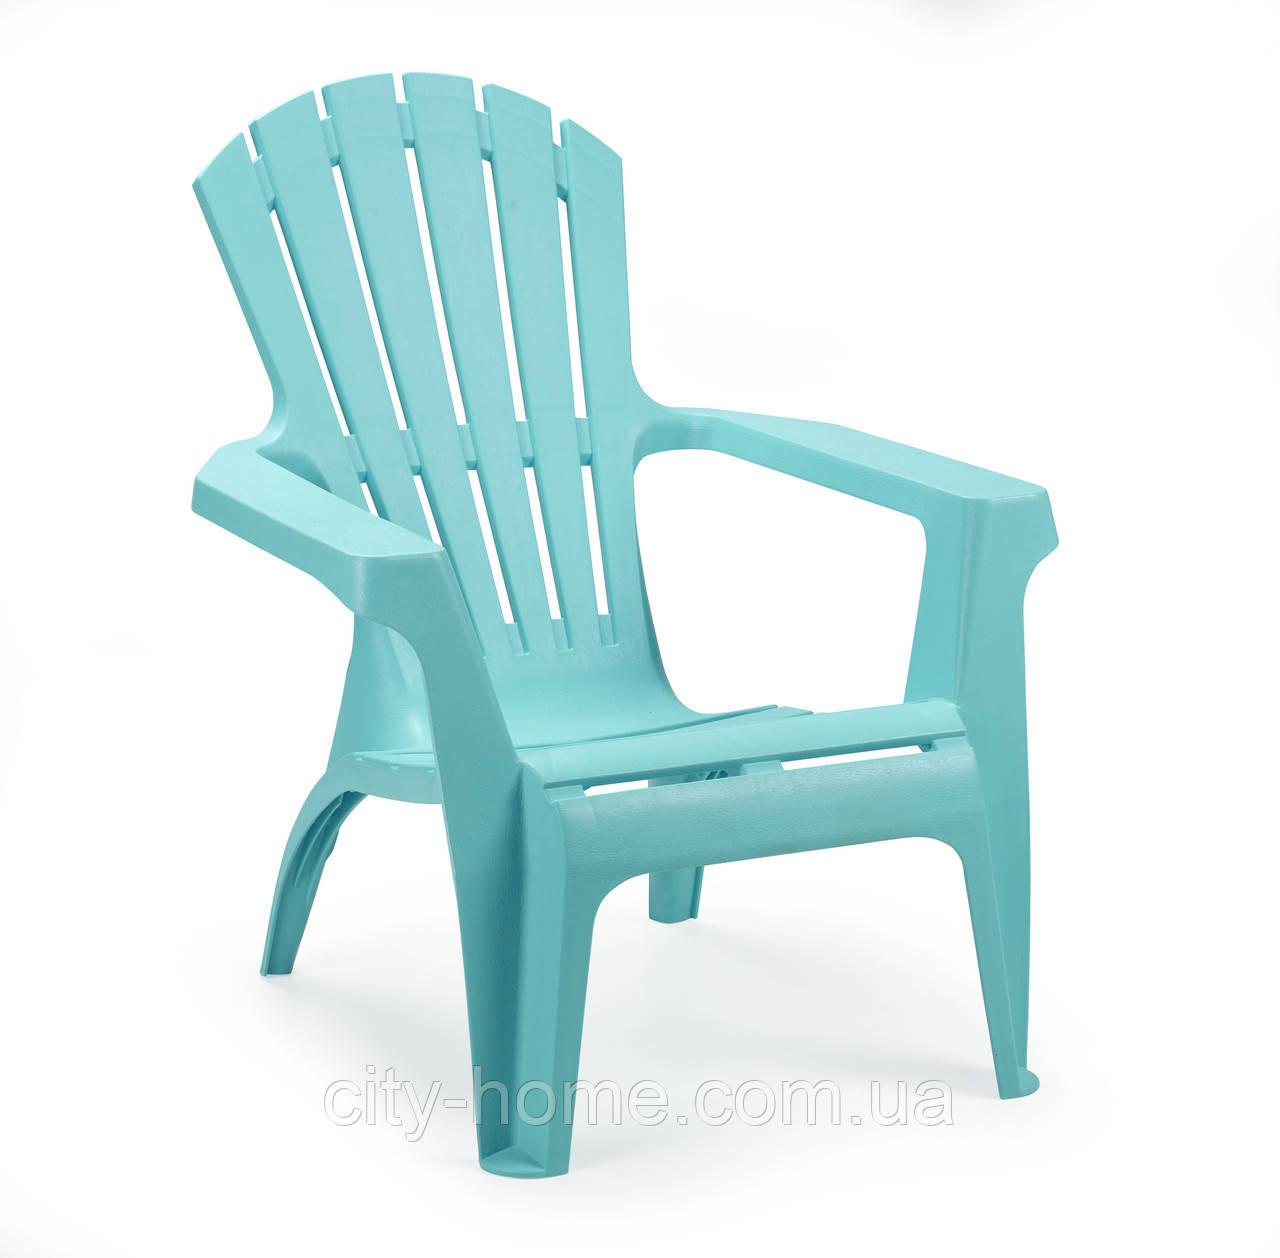 Кресло DOLOMITI голубое